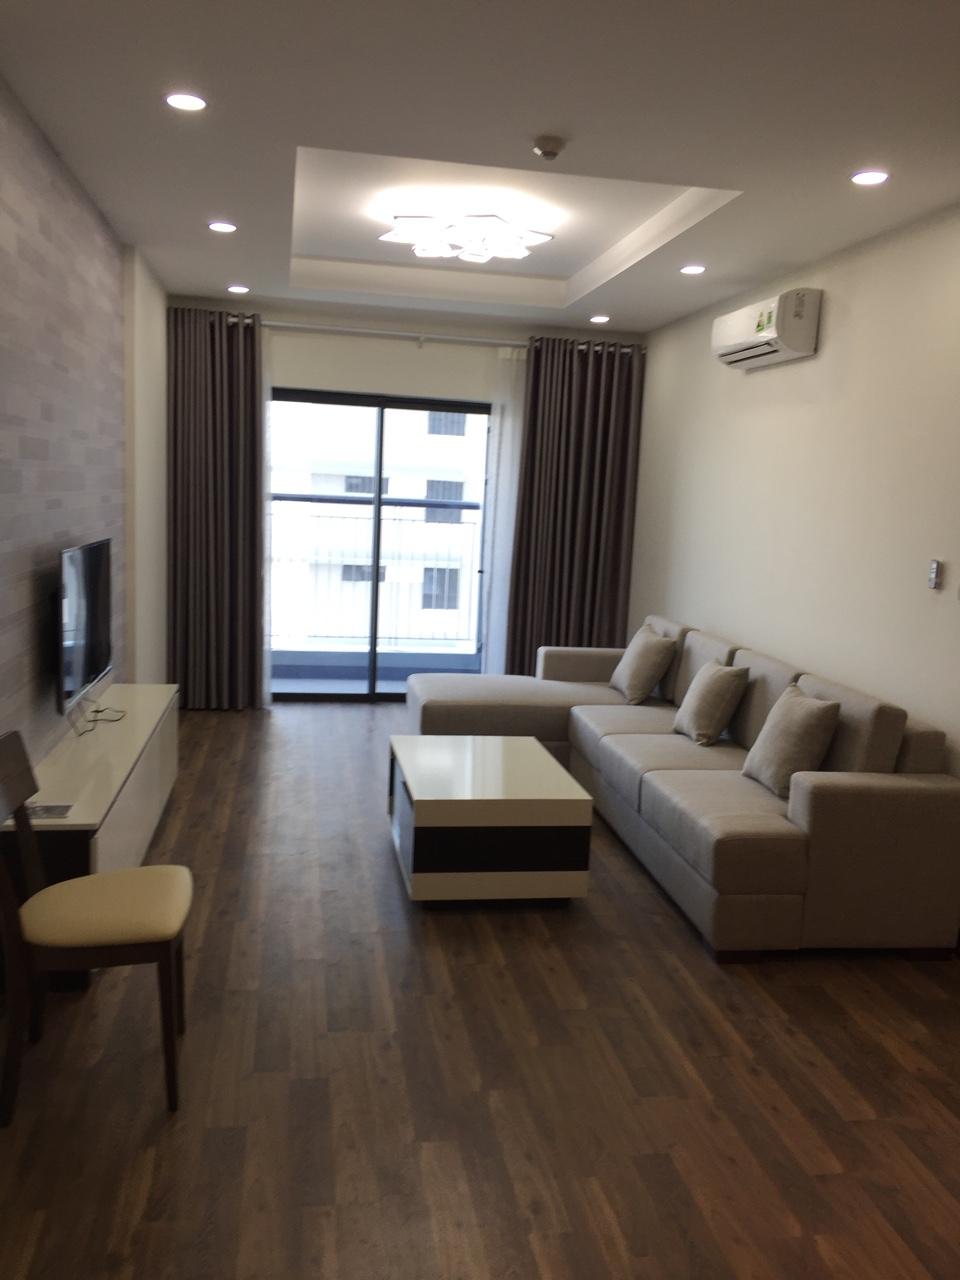 Apartments Goldmark city rental, modern design & fully furnished